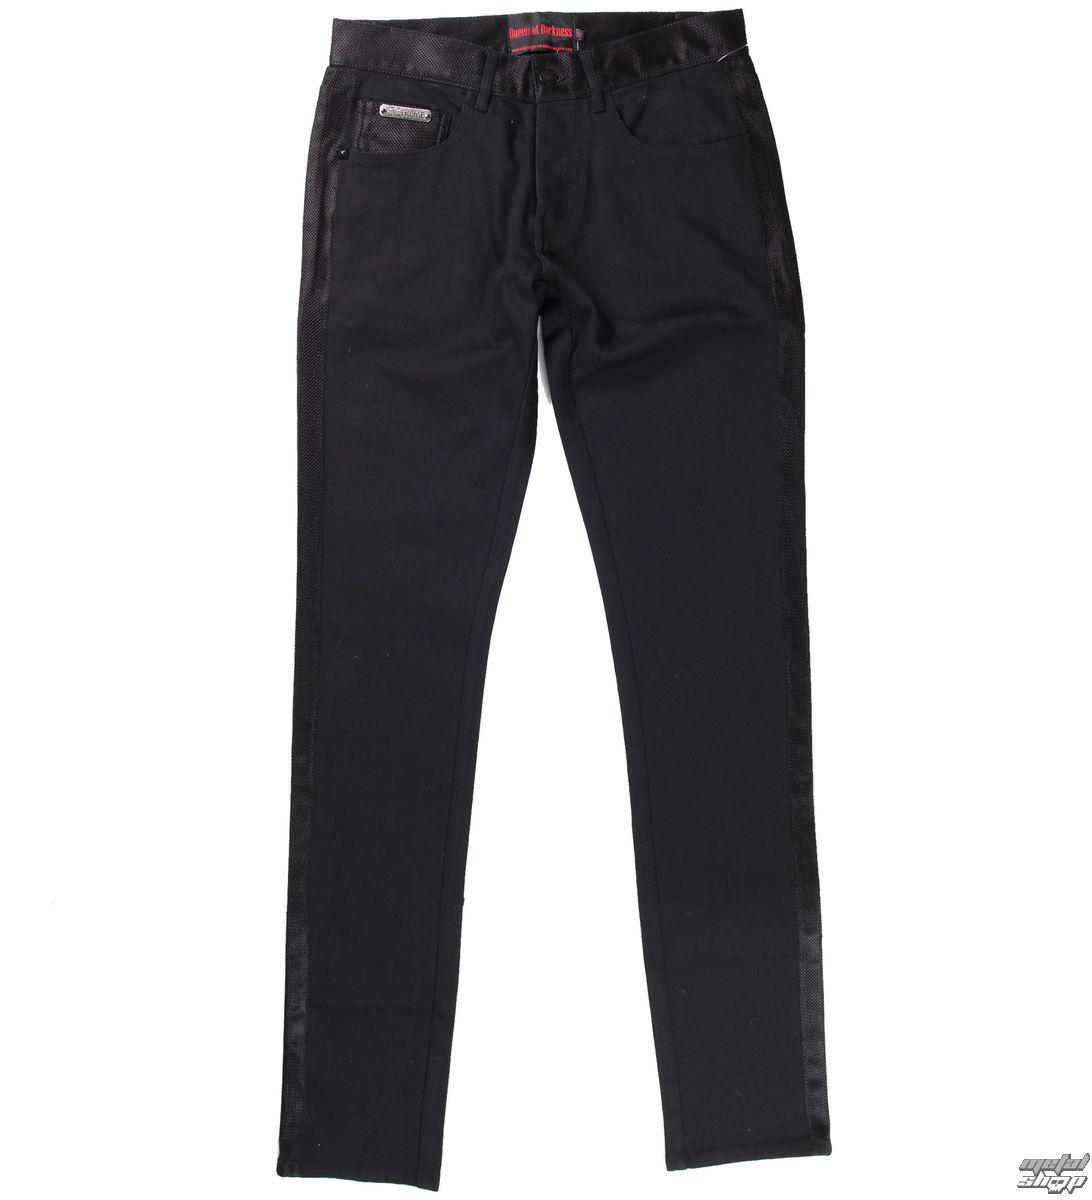 kalhoty QUEEN OF DARKNESS - Black - TR2-176/13